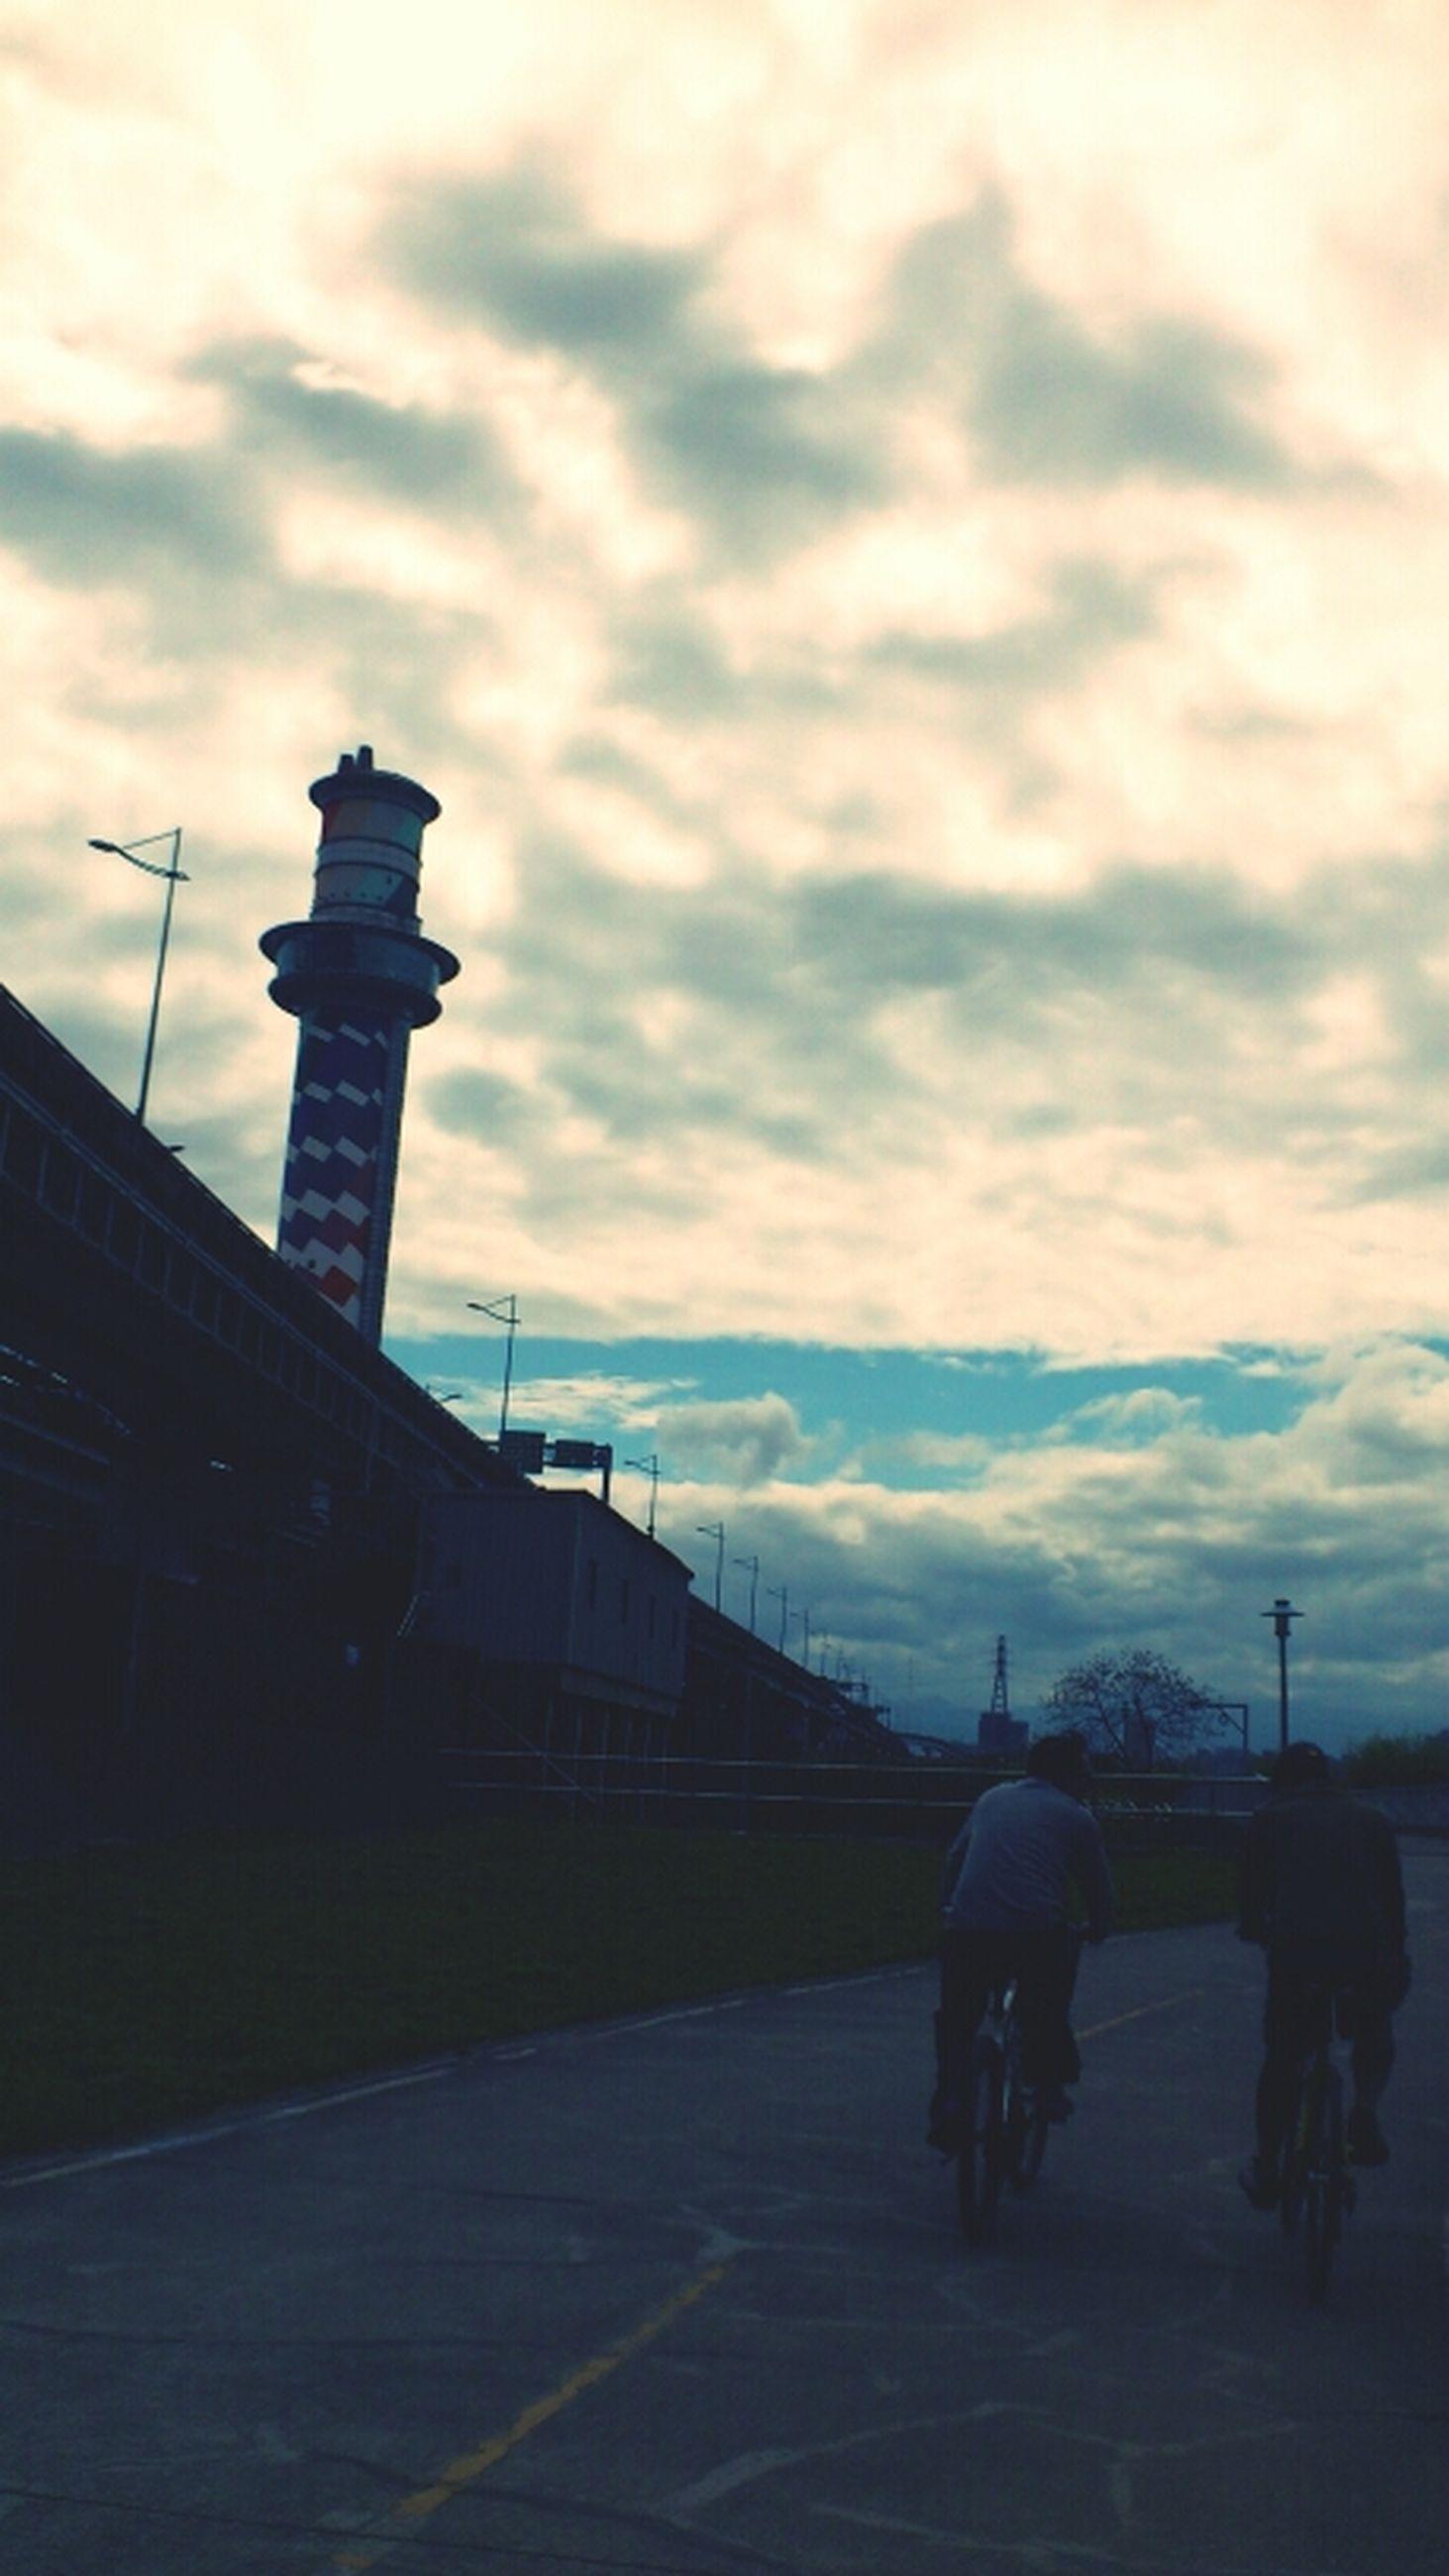 sky, cloud - sky, architecture, built structure, cloudy, building exterior, men, lifestyles, cloud, silhouette, weather, transportation, leisure activity, full length, railing, street light, dusk